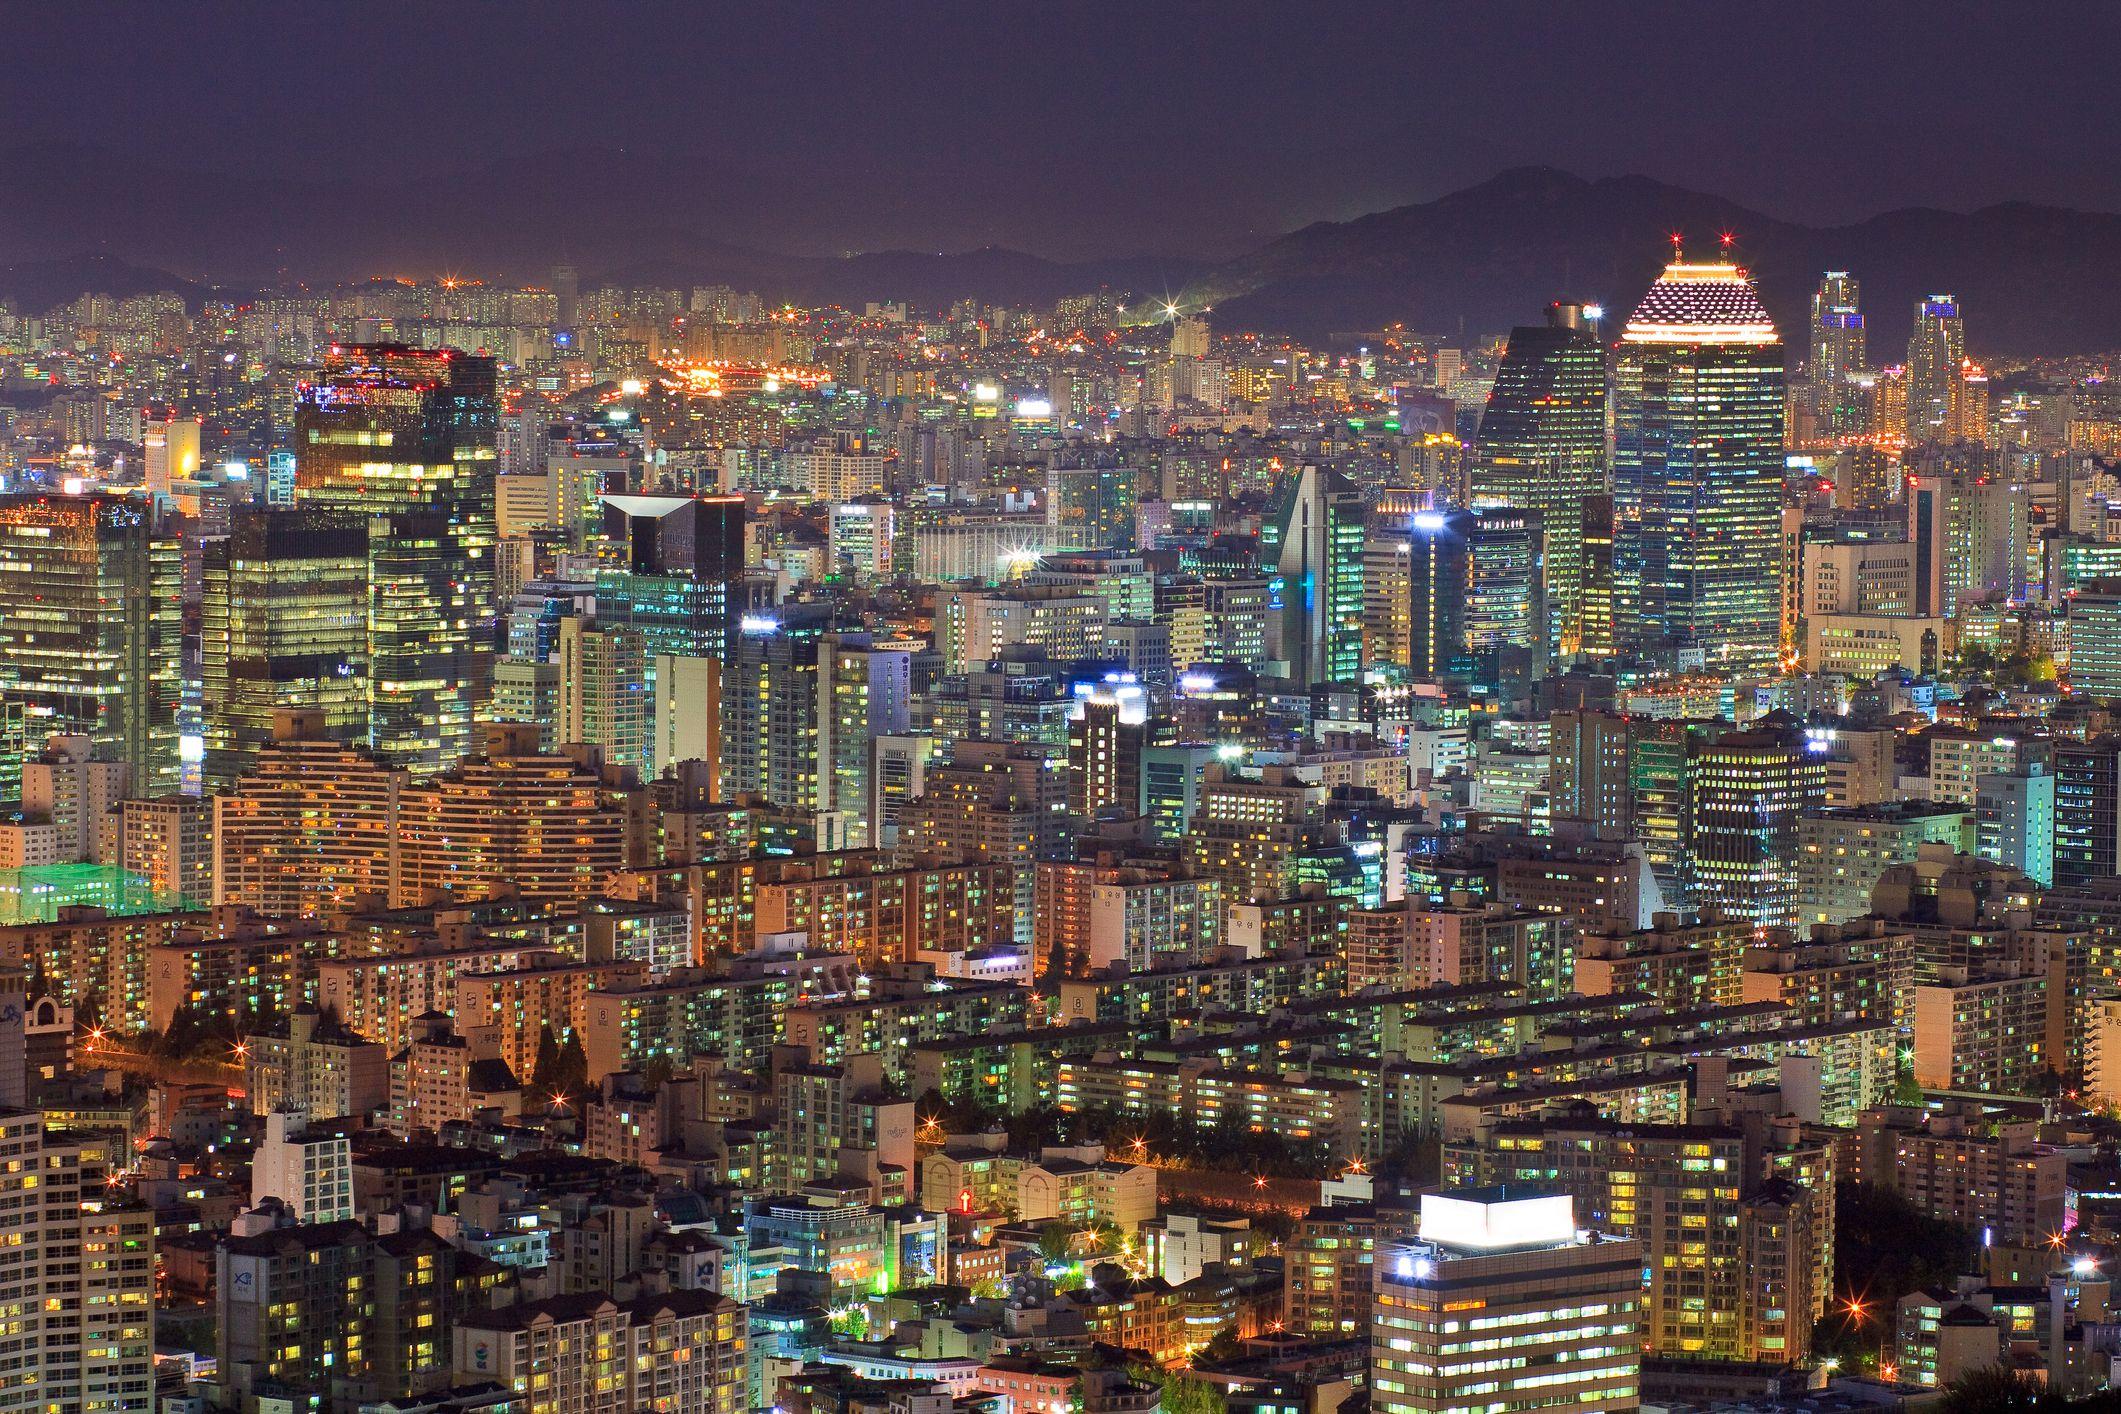 The Ritz-Carlton Seoul, Korea: Luxury Hotel with Gangnam Style